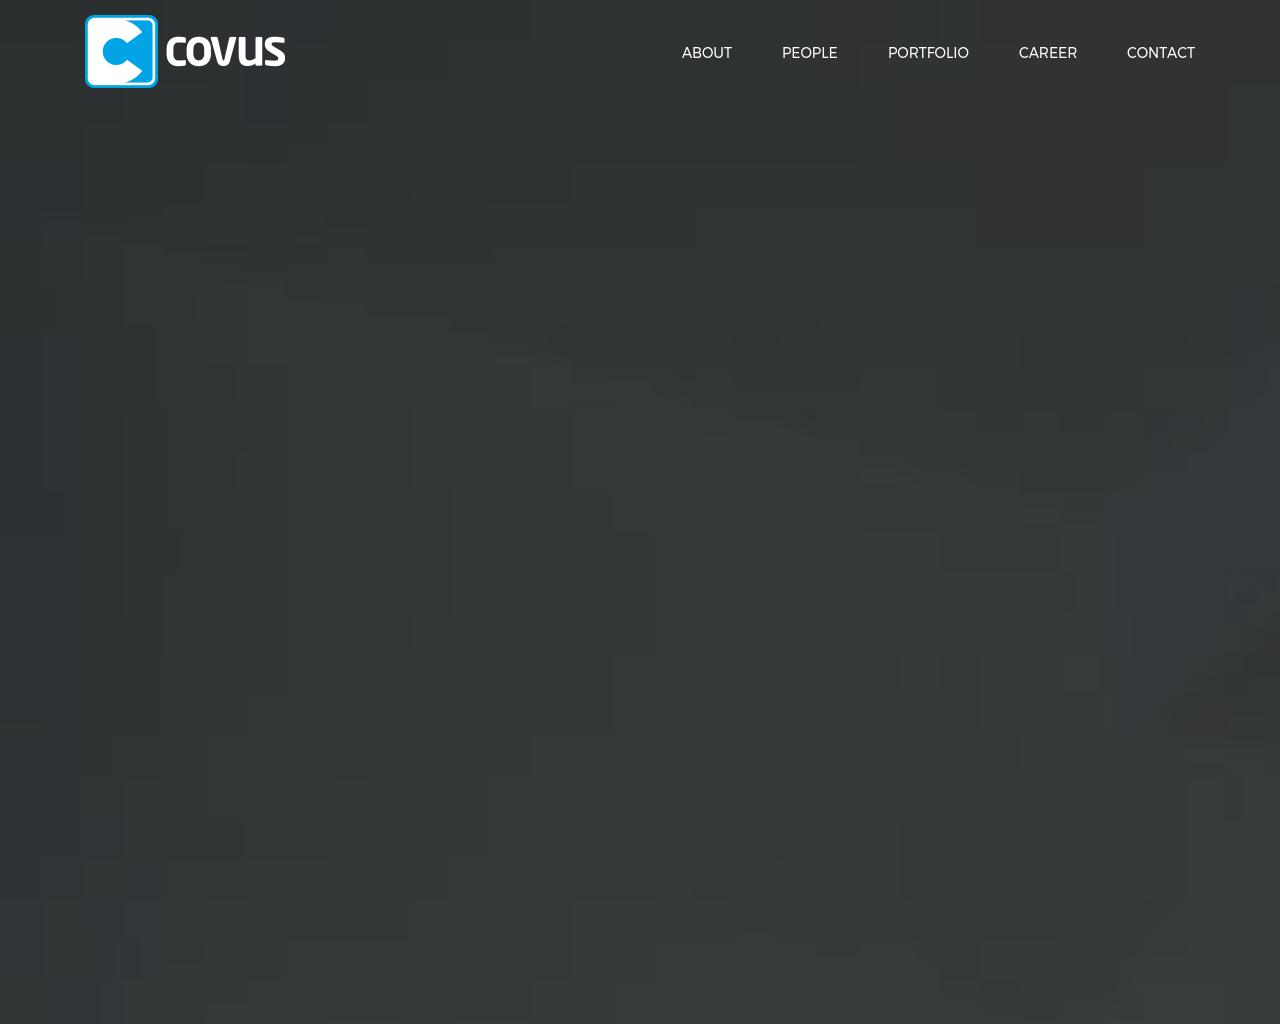 Covus-Advertising-Reviews-Pricing